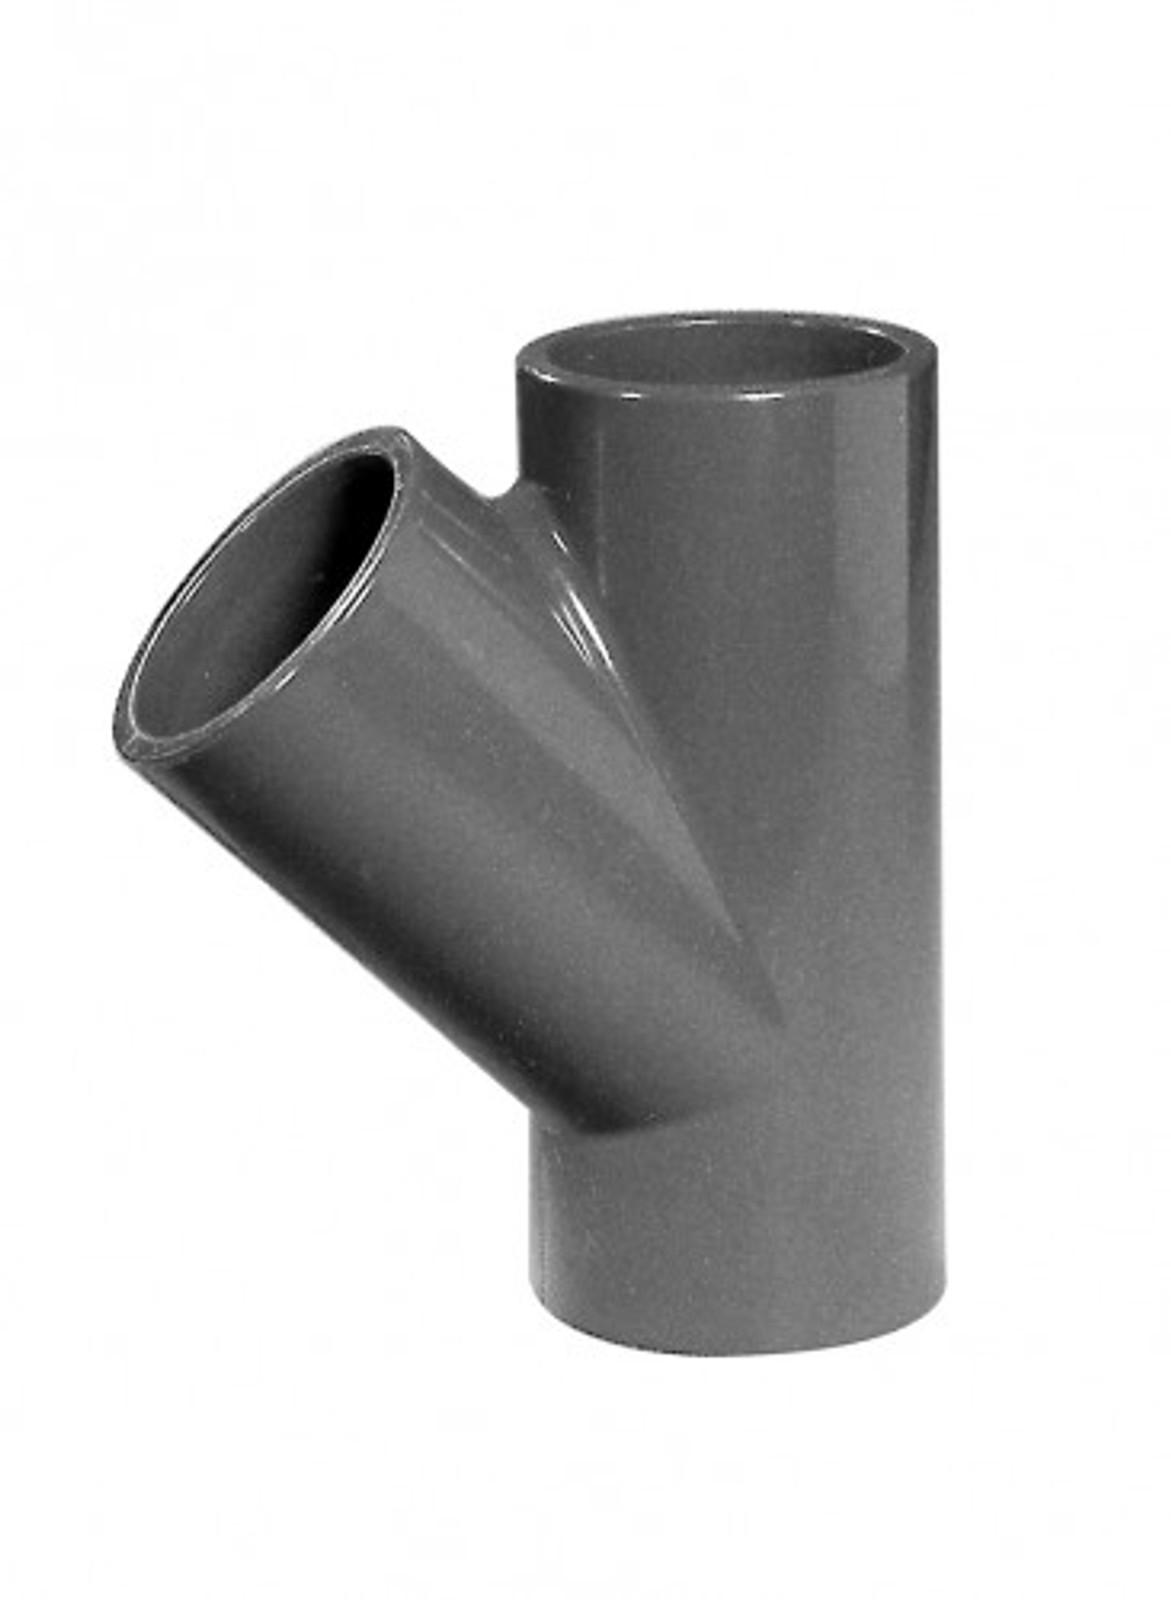 T-Stück 45°, 63 mm aus PVC